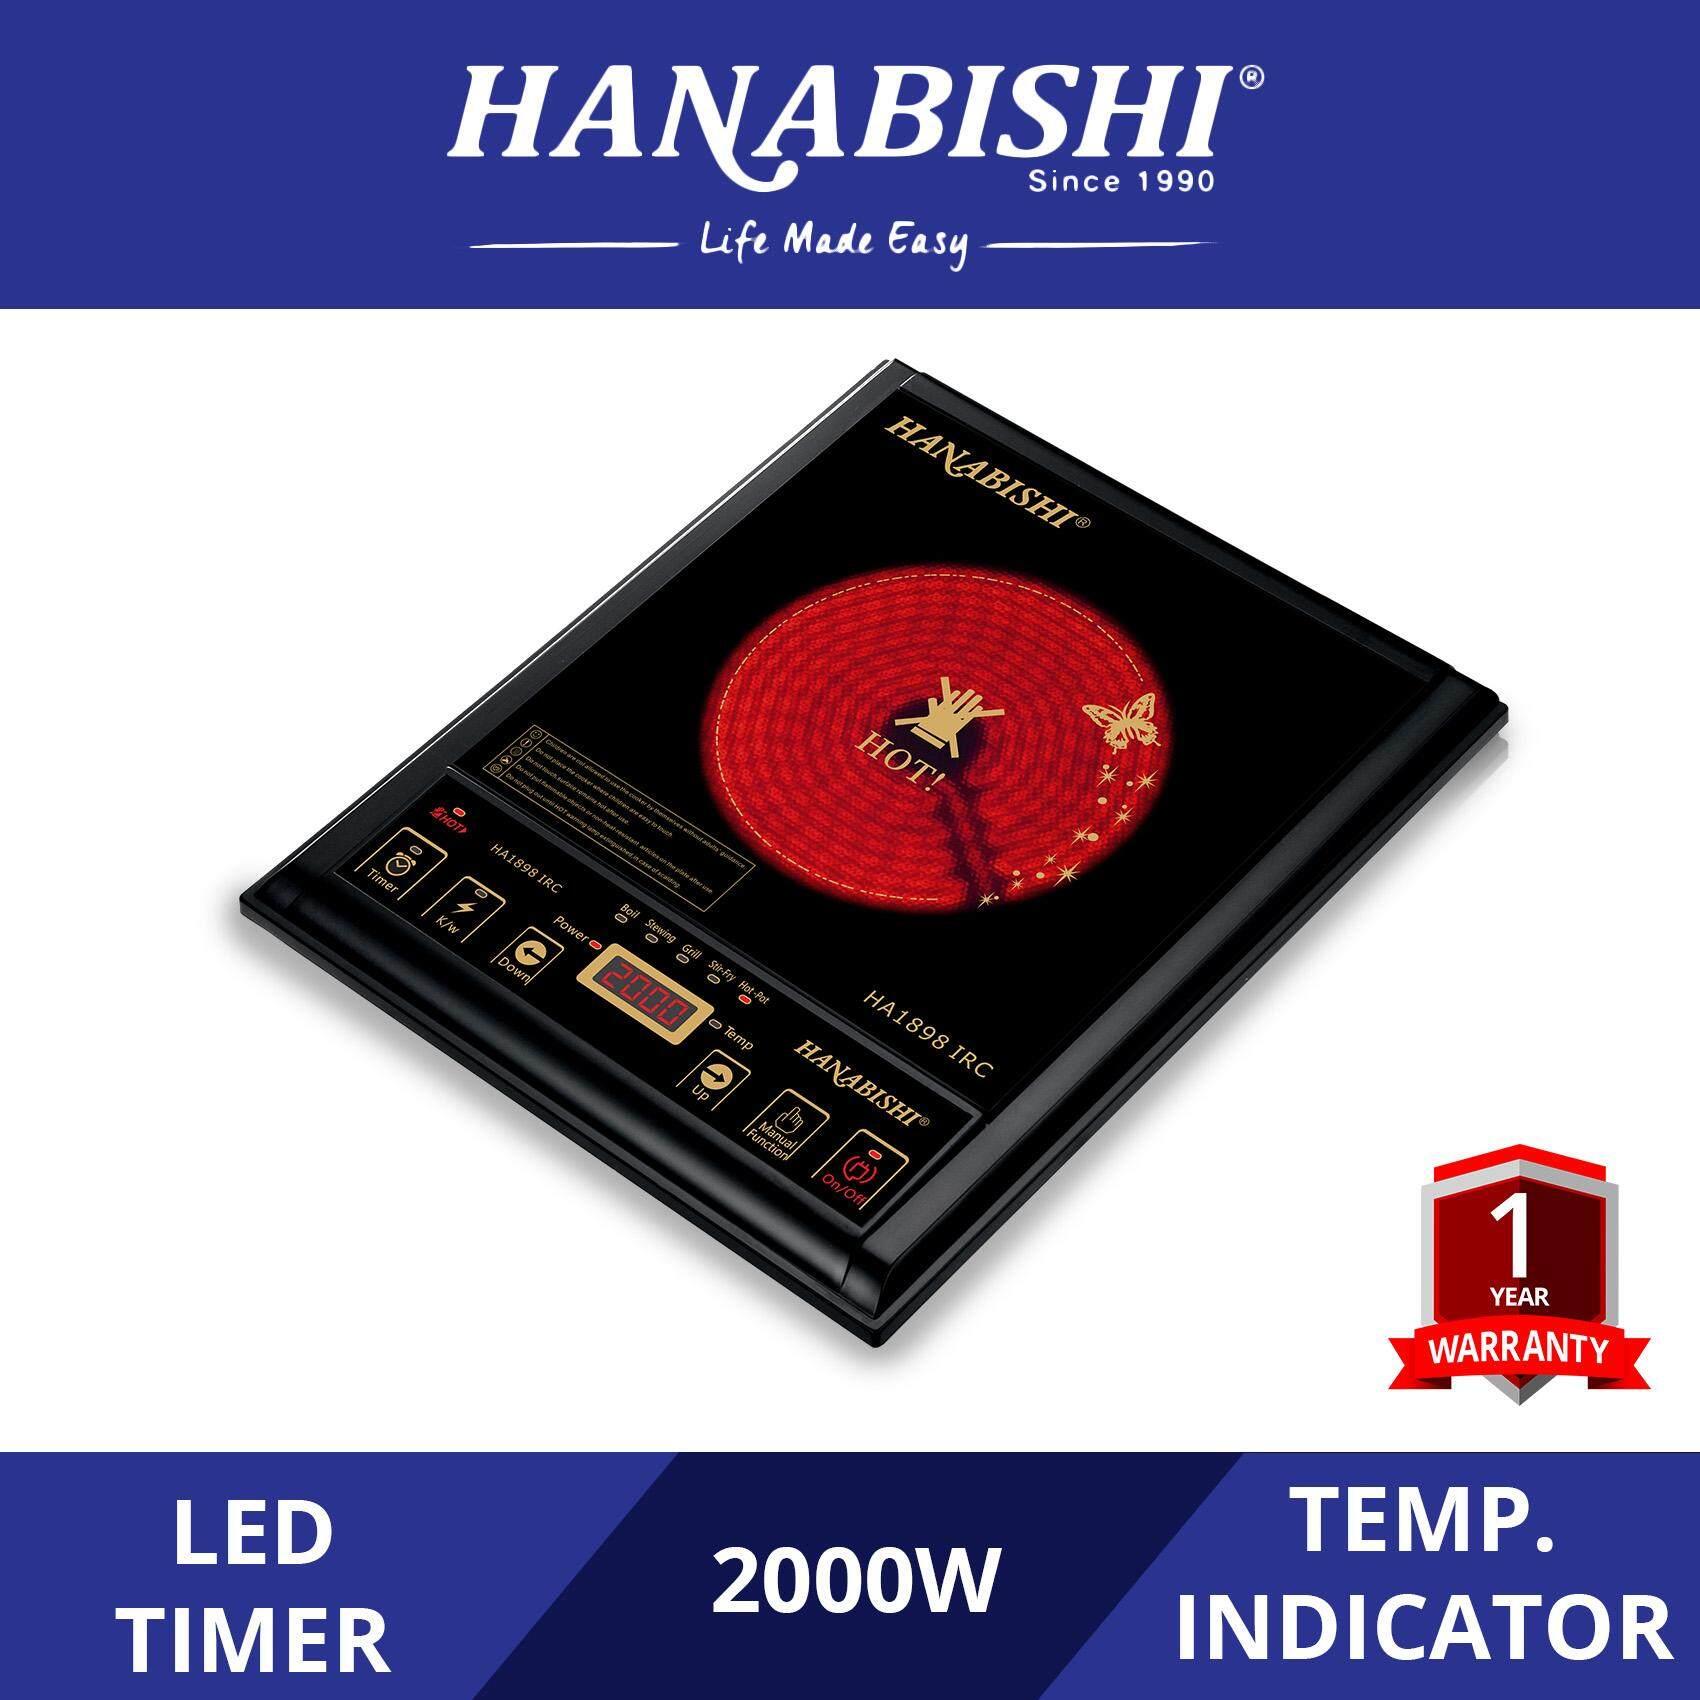 Hanabishi Infrared Ceramic Cooker HA-1898IRC